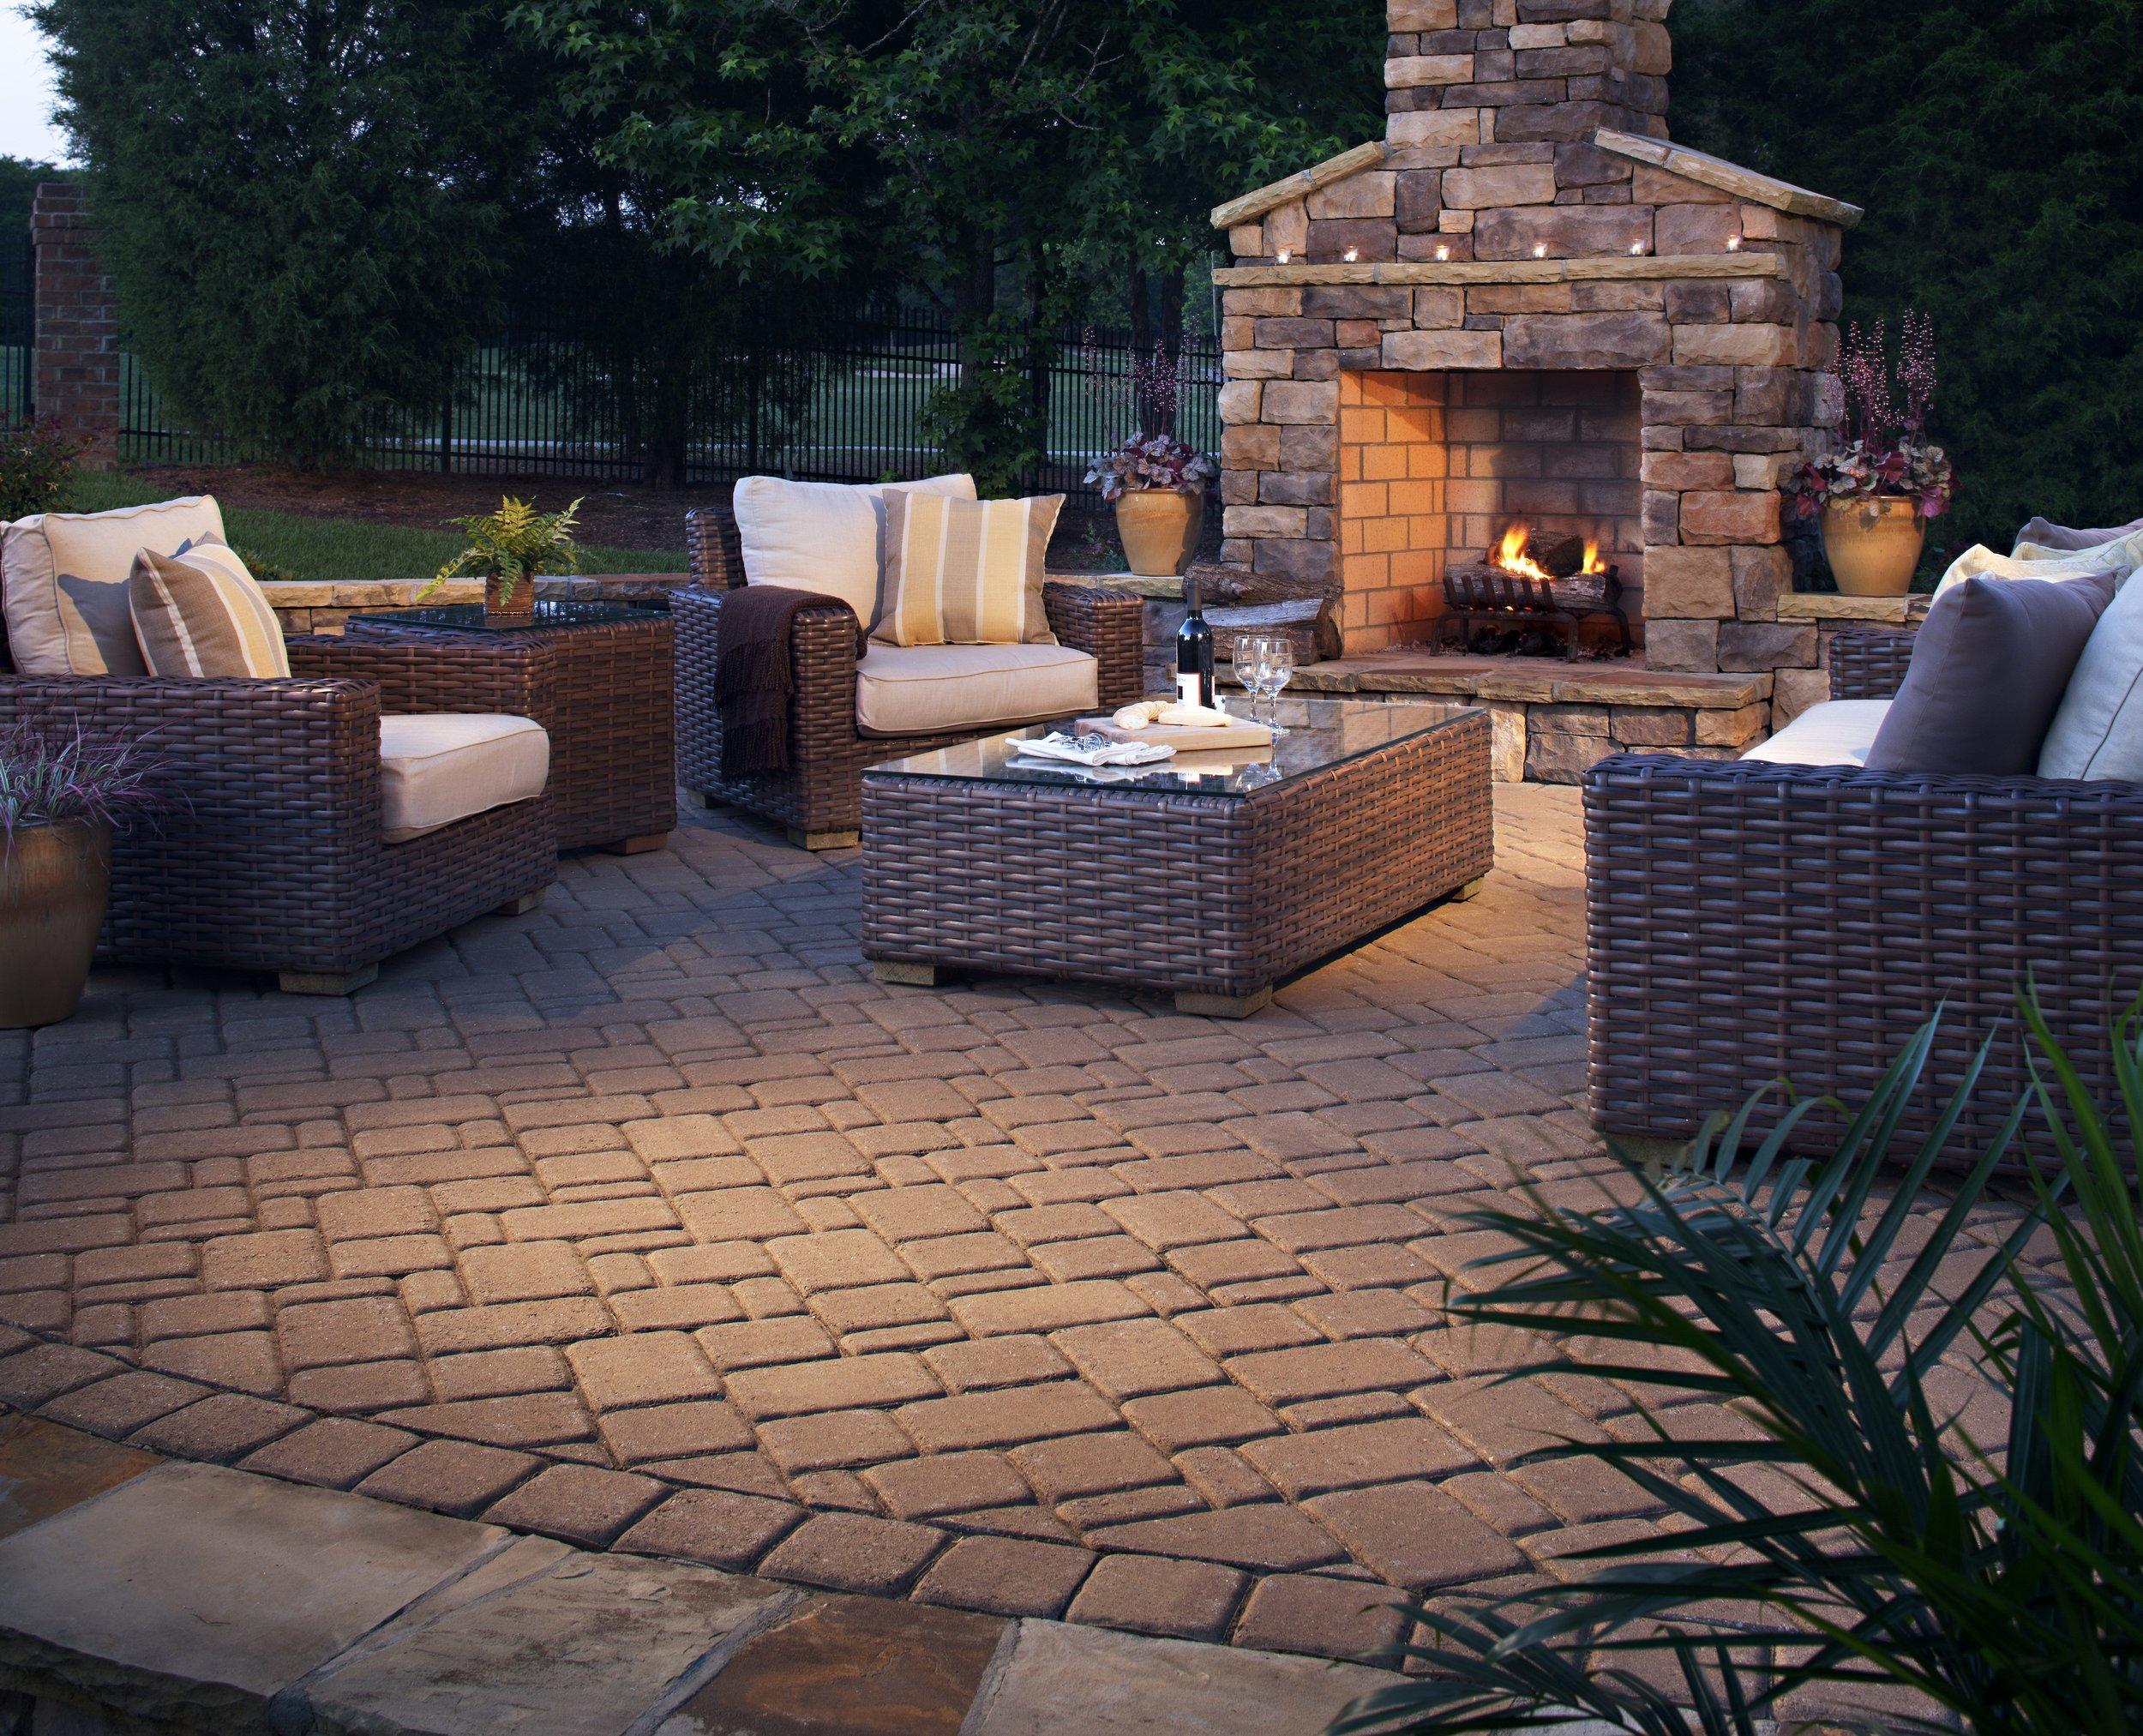 outdoor fireplace paver patio landscape plantings